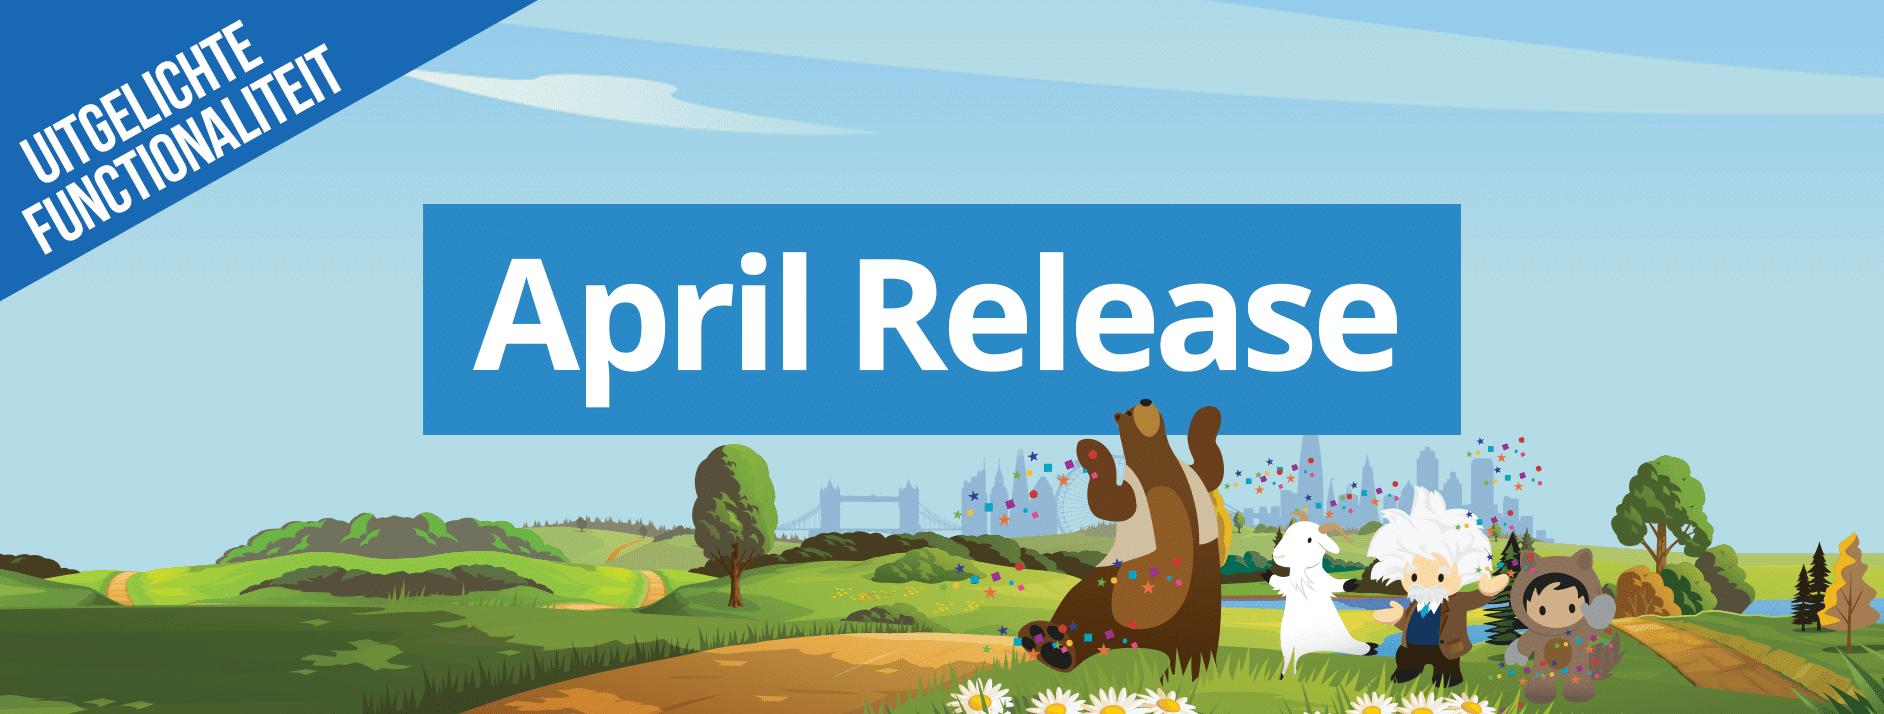 4.0 release   April 2021